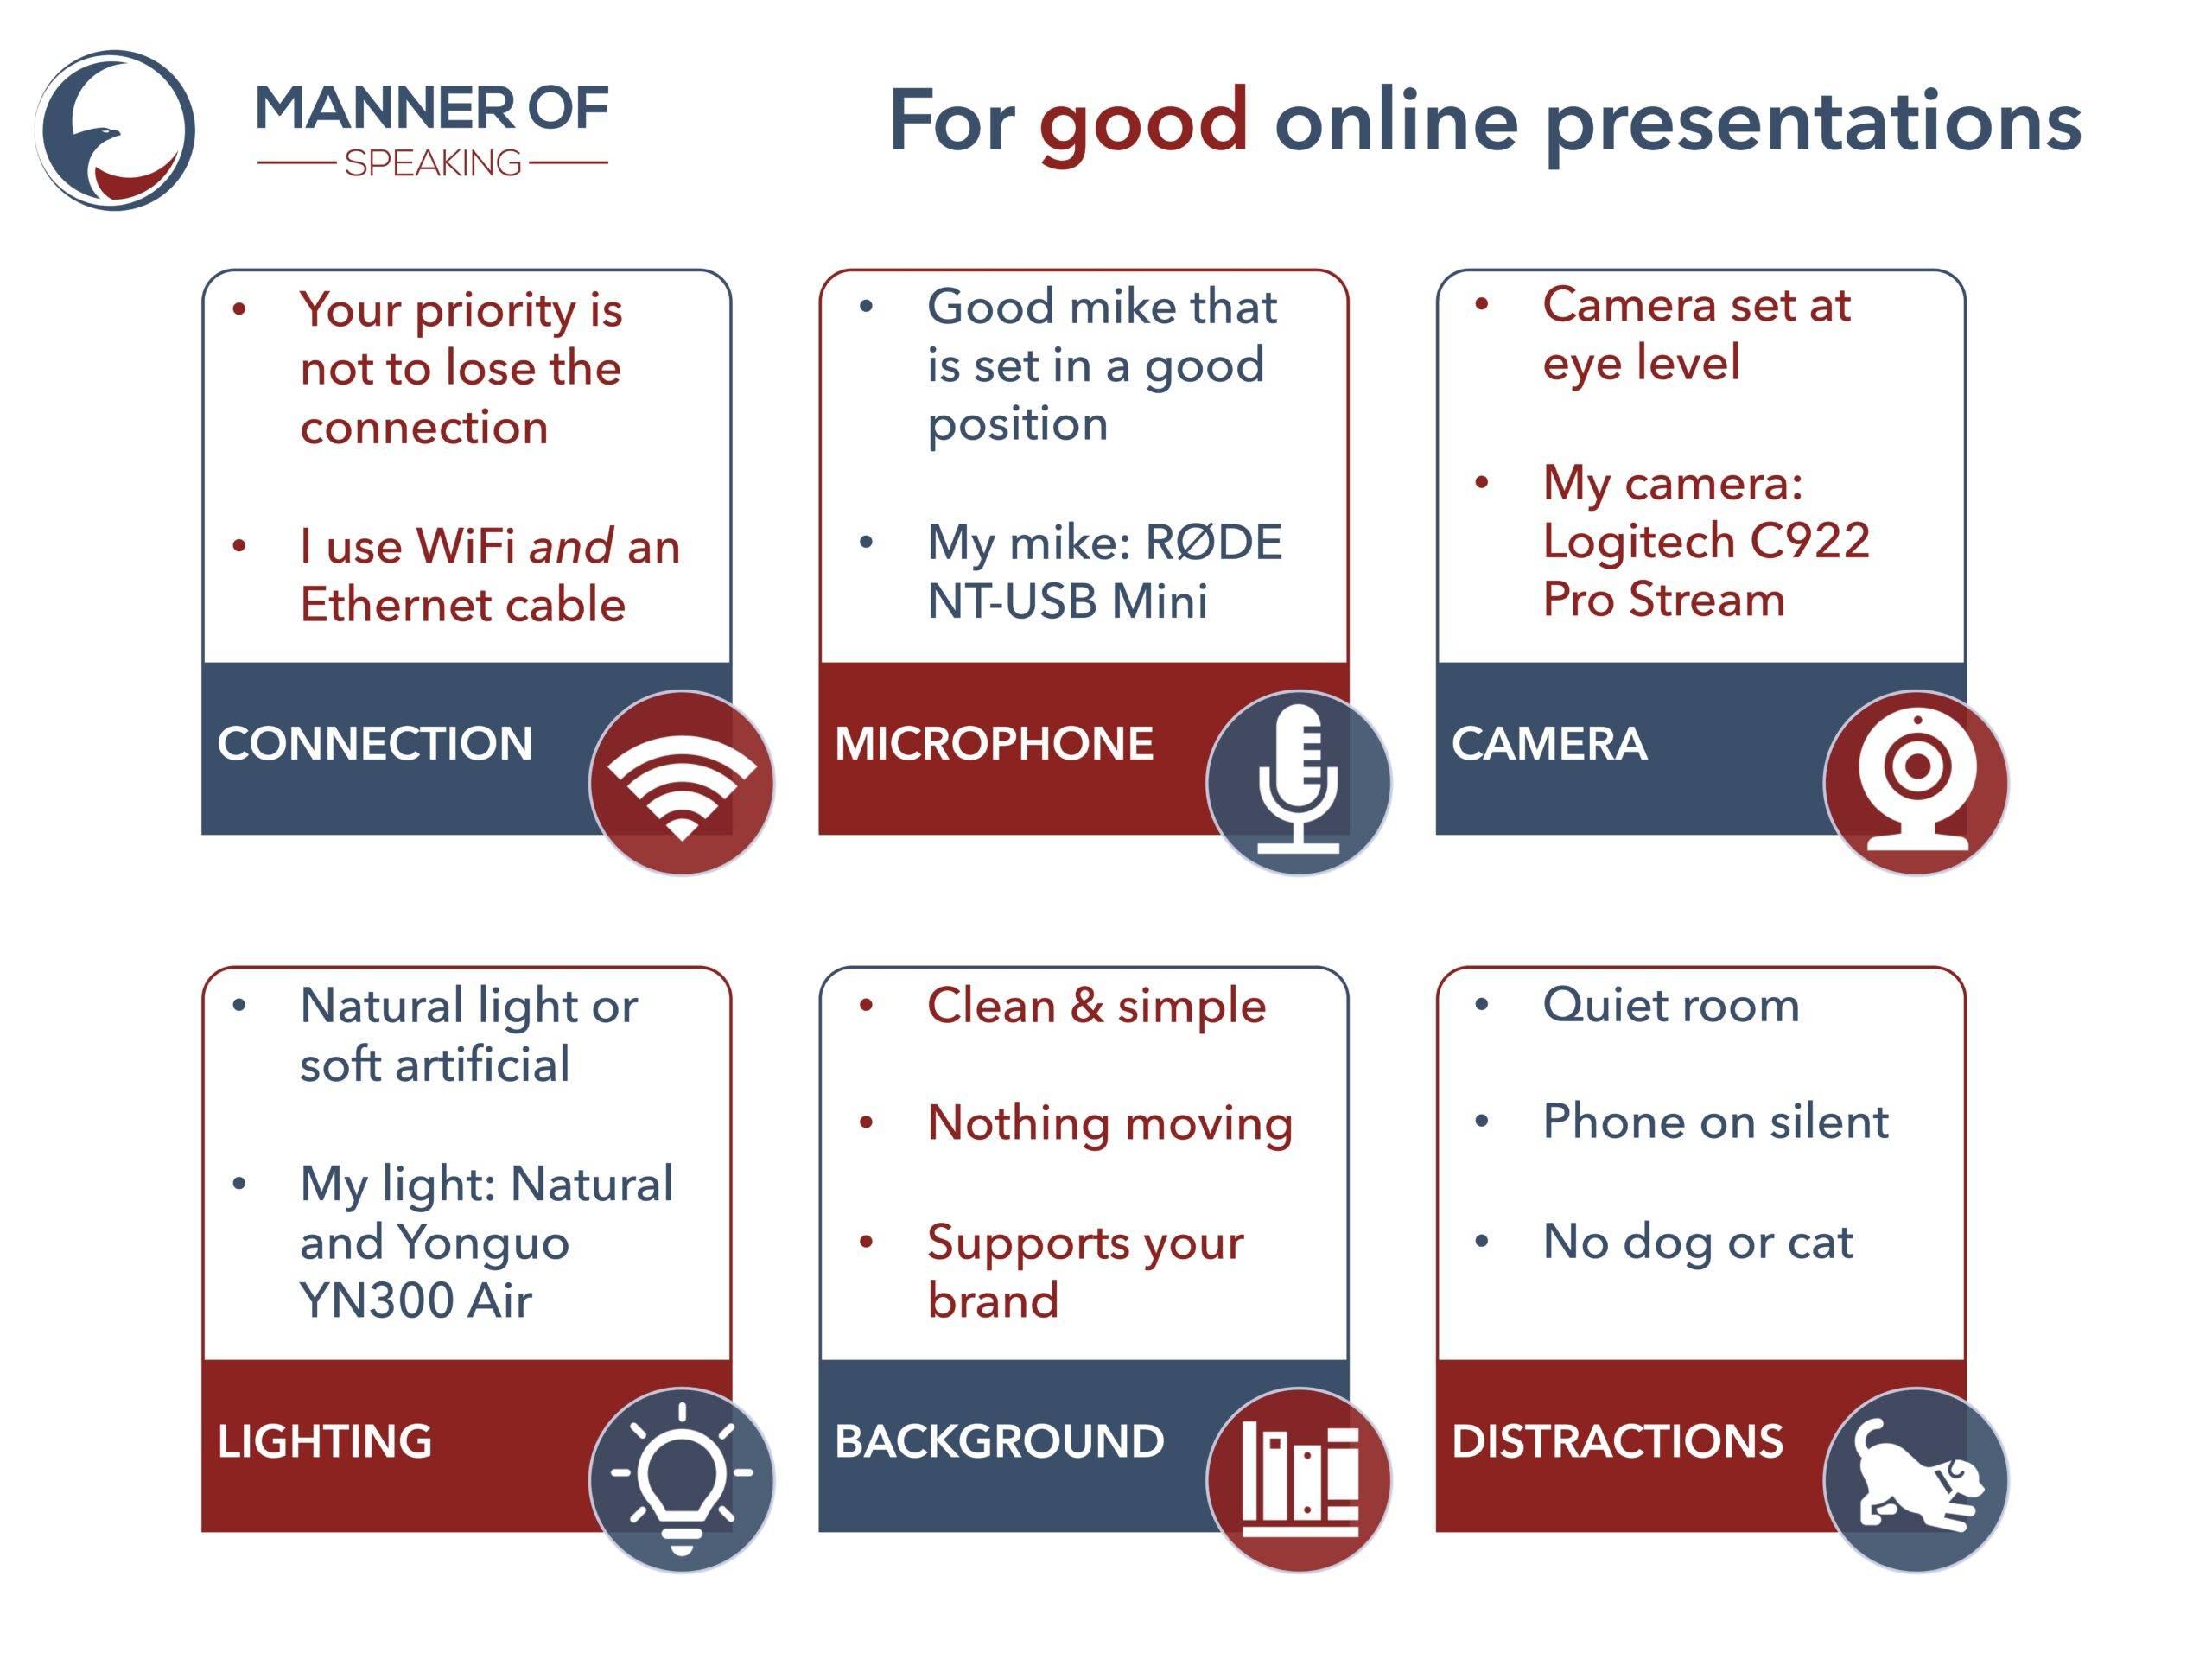 Technical tips for online presentation